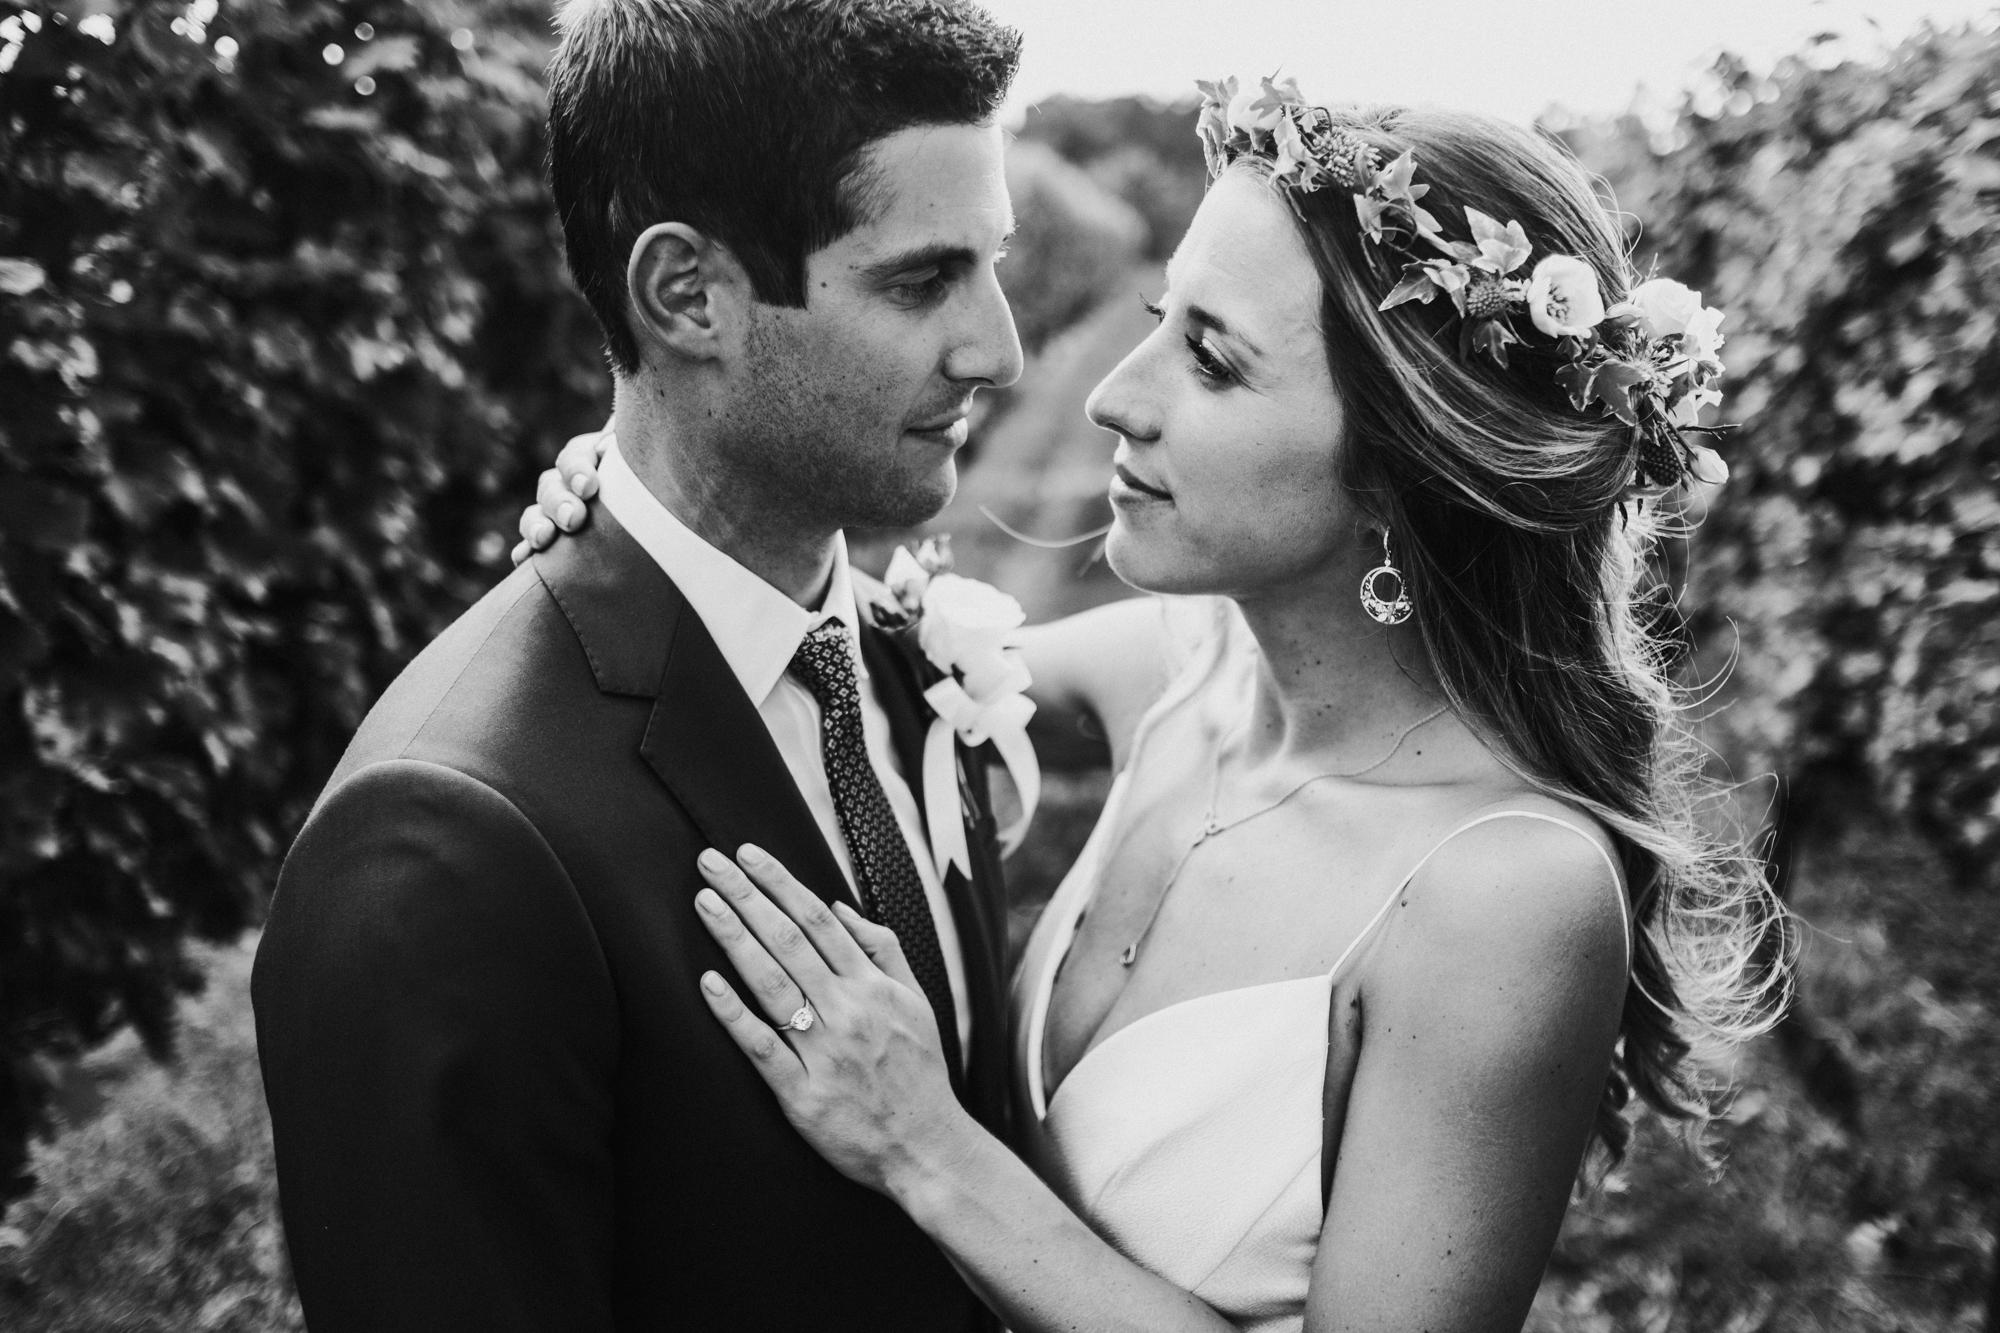 Wedding_Francis_Boucher_Jonathan_Edwards_Winery_2018-30.jpg